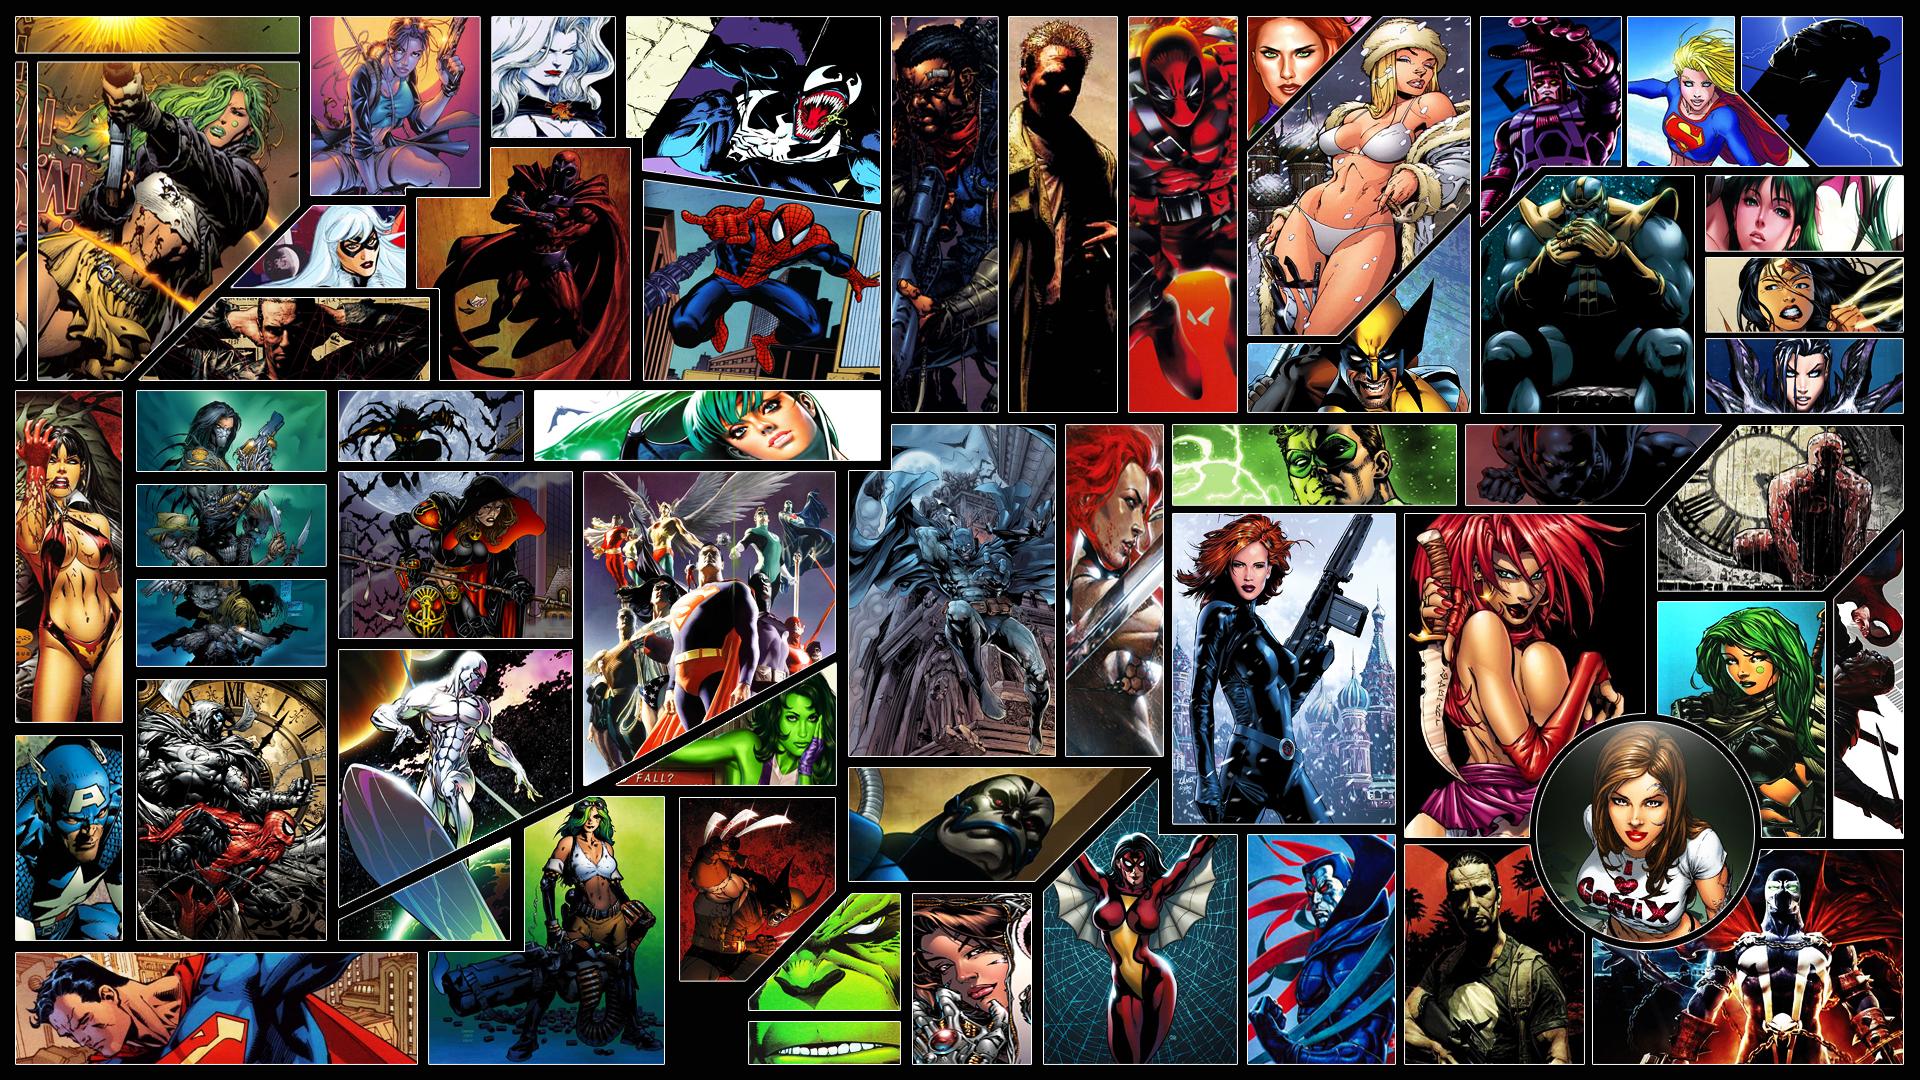 http://3.bp.blogspot.com/-XU5dA39rcyY/UEM2VdVU_WI/AAAAAAAAEms/R78zQNOPLHI/s1920/dc-comics-marvel-1080.jpg